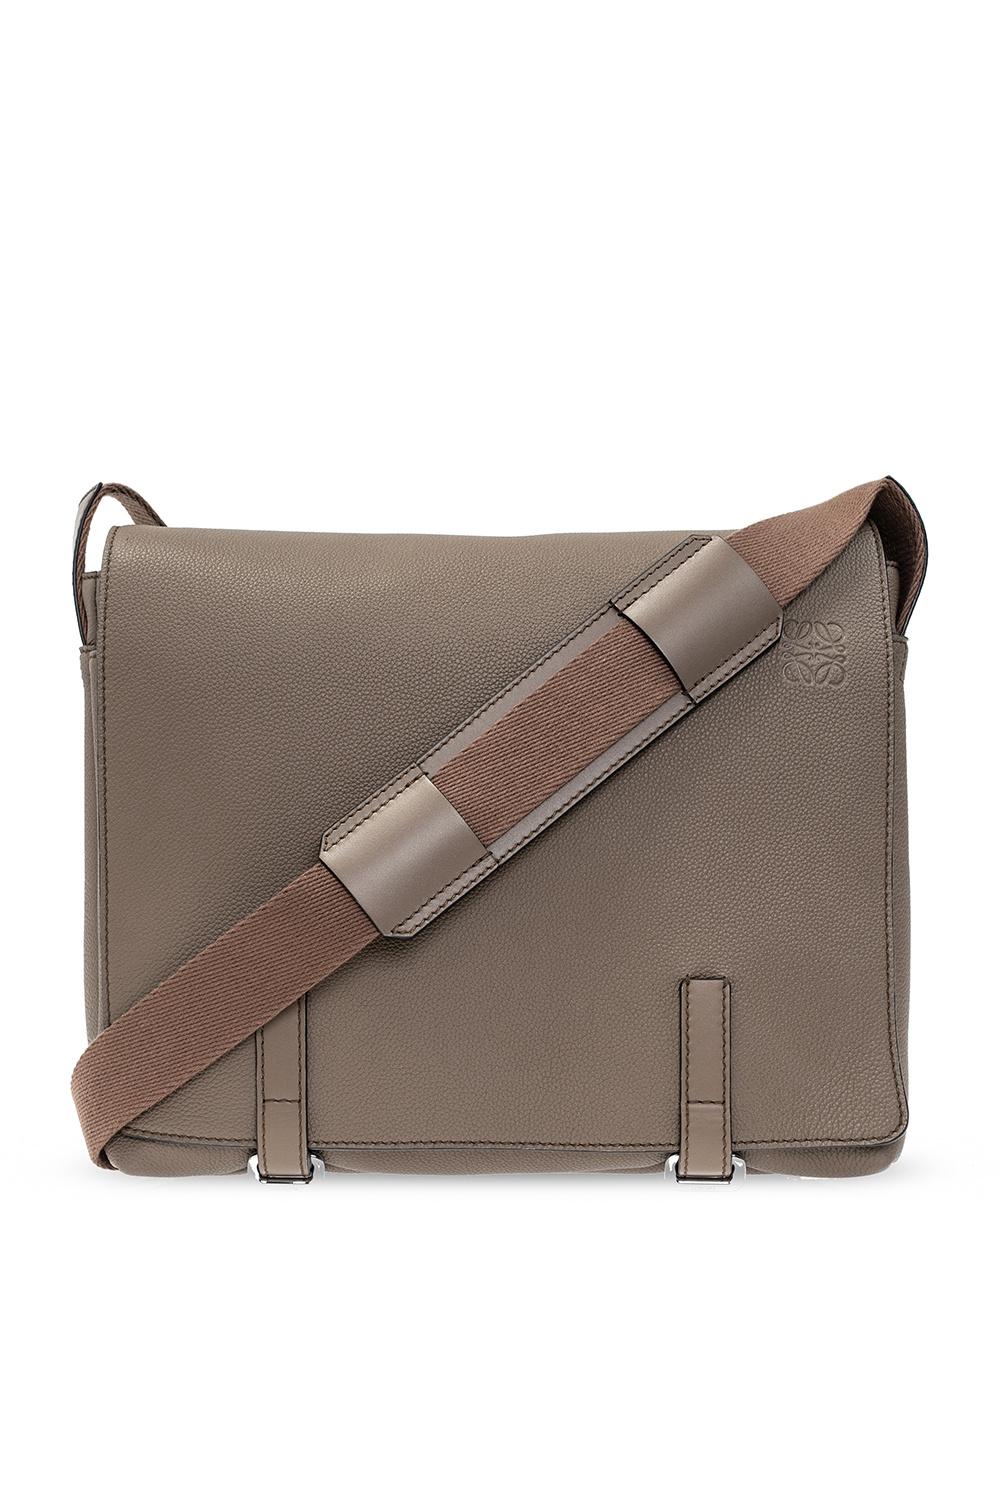 Loewe 'Military' shoulder bag